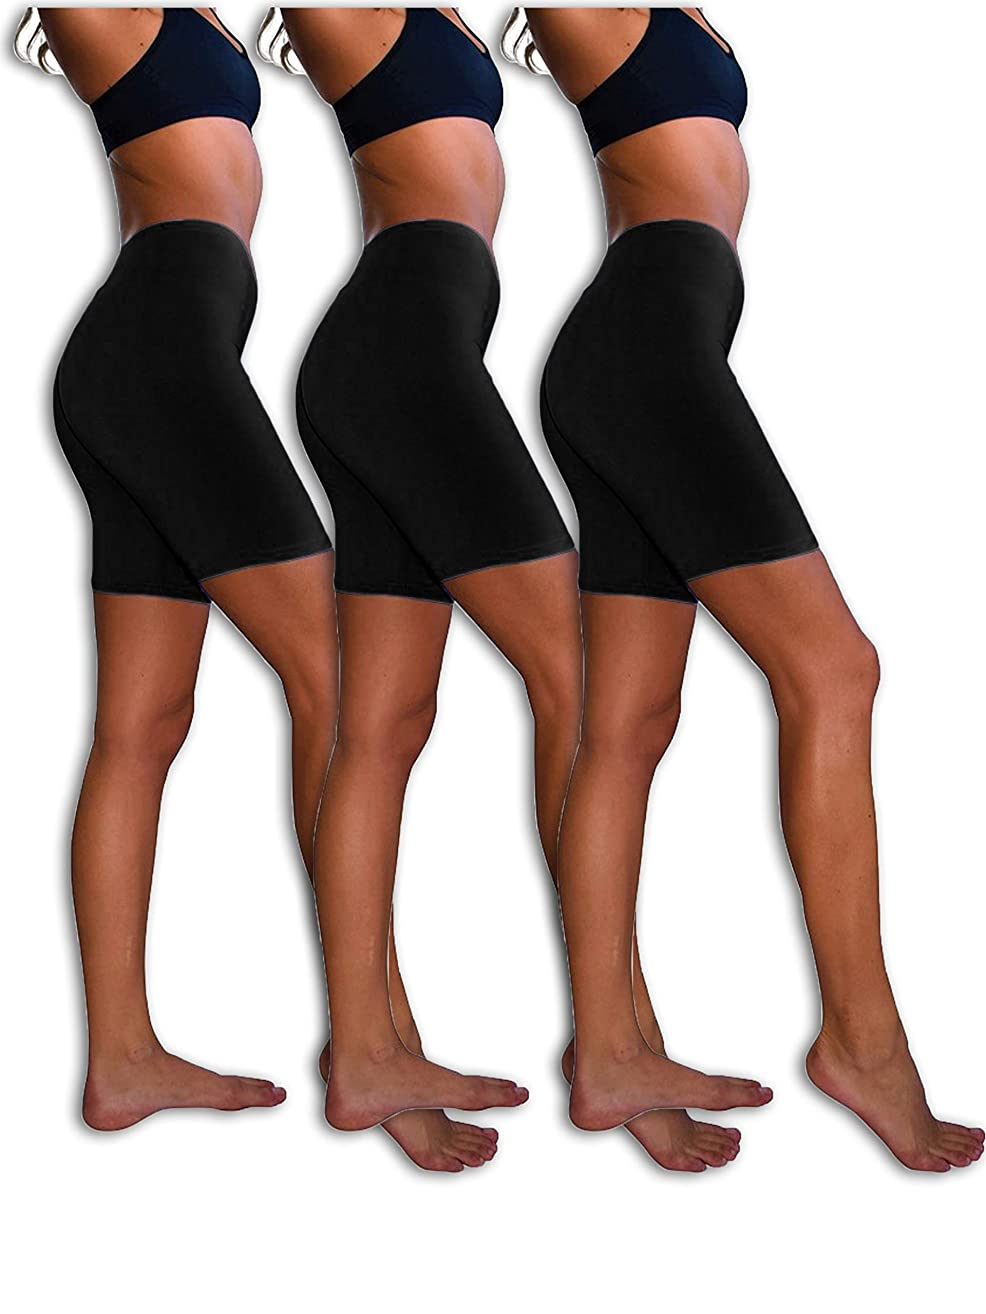 Sexy Basics Slip Shorts | 3-Pack Bike Shorts | Cotton Spandex Stretch Boyshorts for Yoga/Workouts